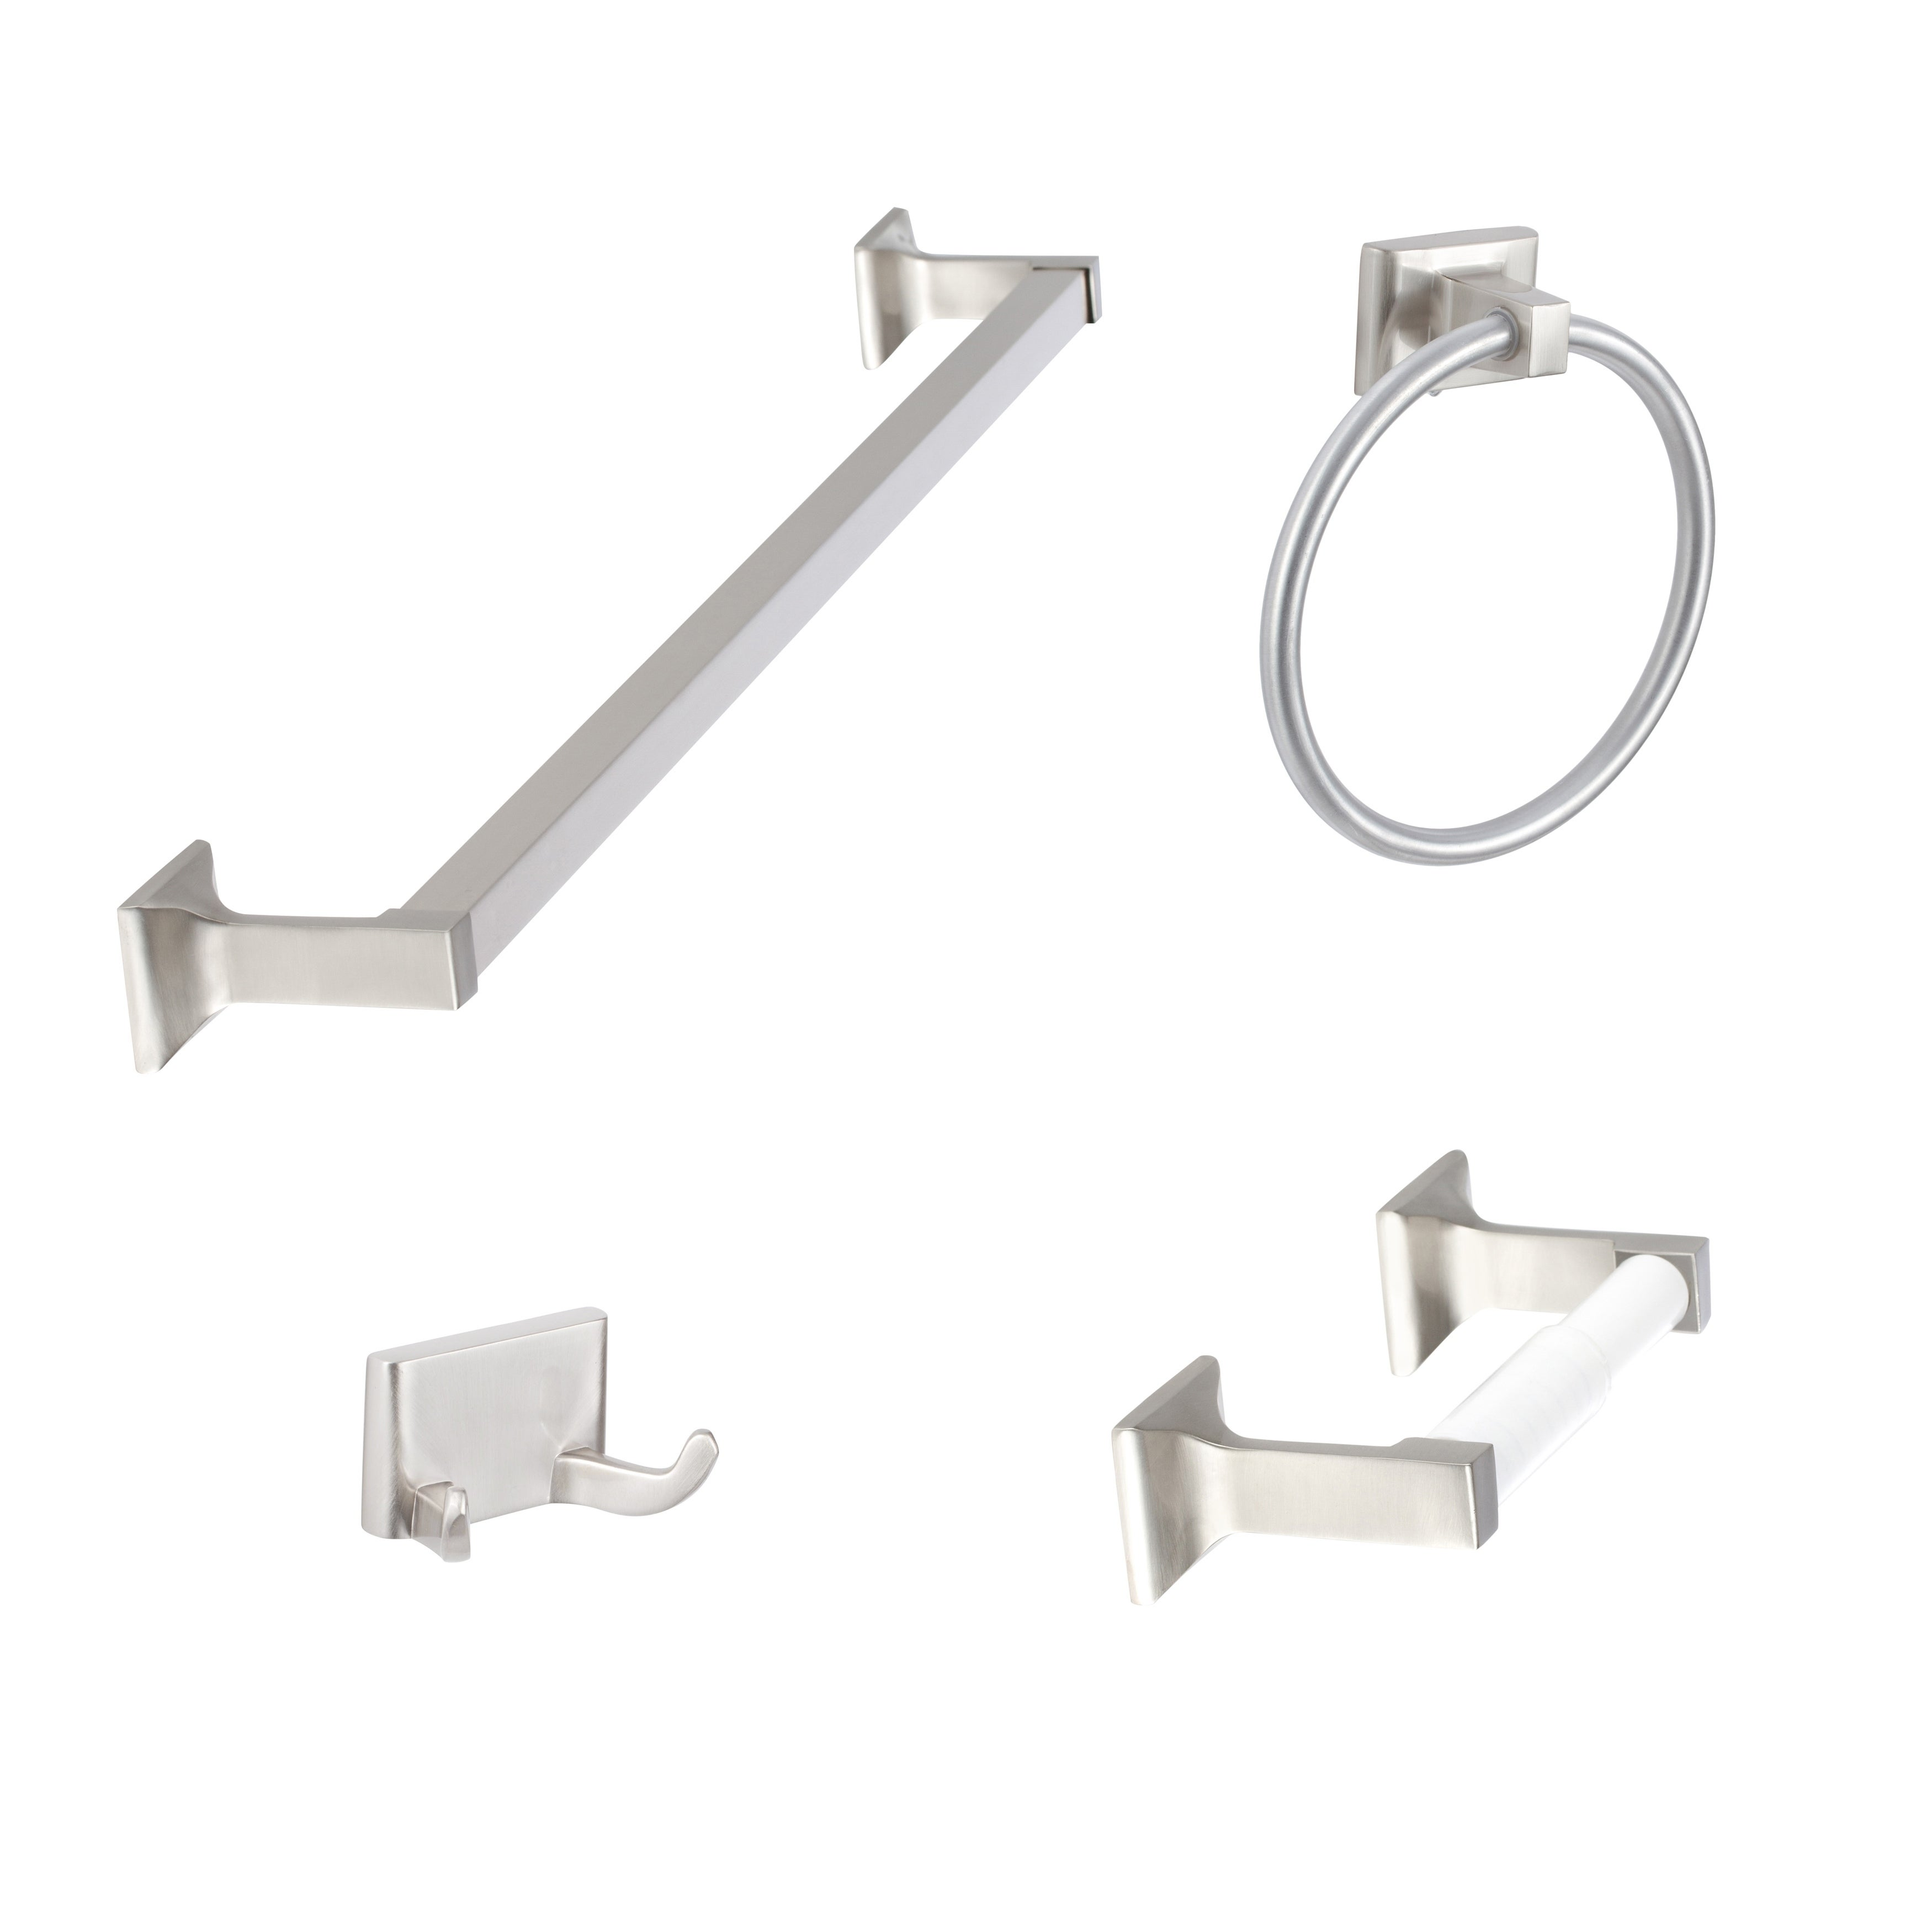 SURE-LOC HARDWARE Sure-Loc Basic 11-piece Bathroom Accessory Set -  Walmart.com